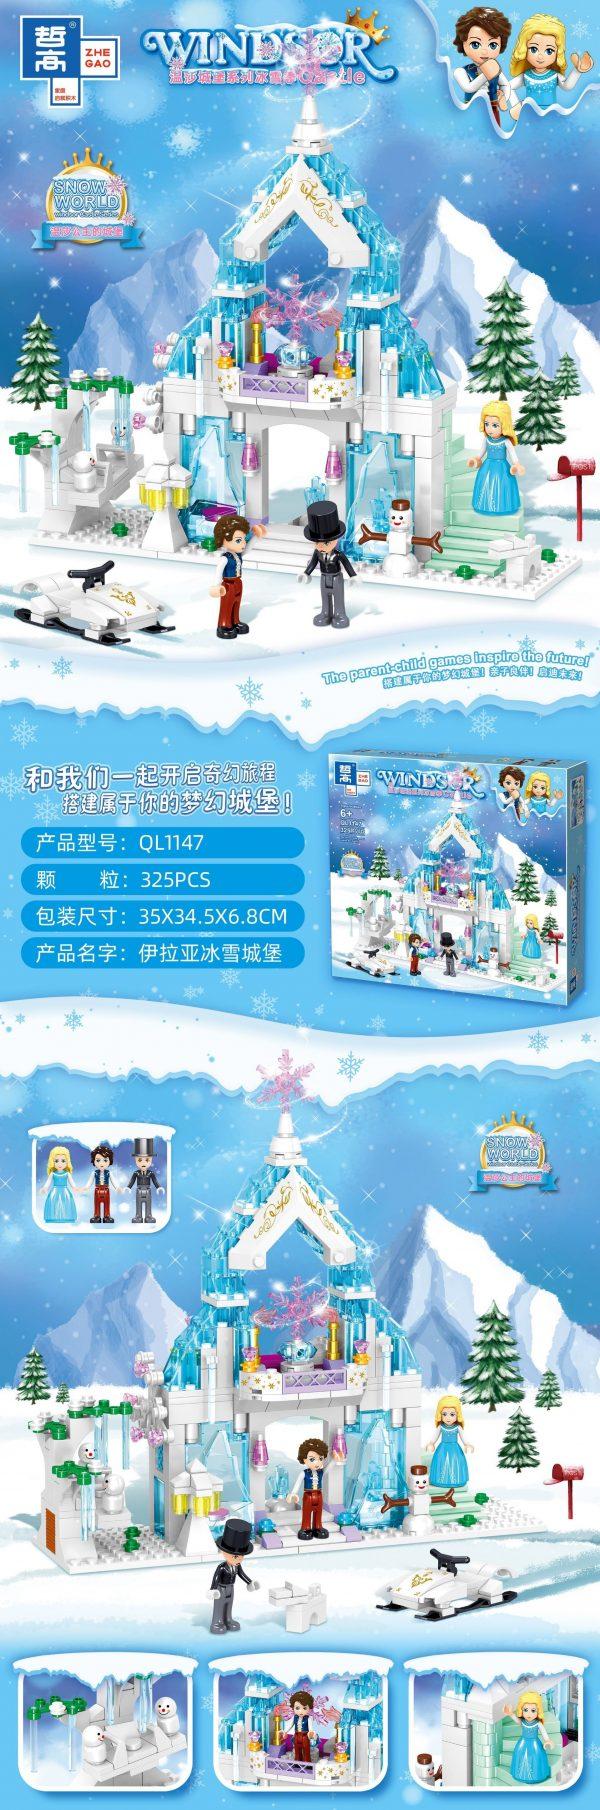 ZHEGAO QL1147 Windsor Castle Series Snow Season: Iraya Ice Castle 0